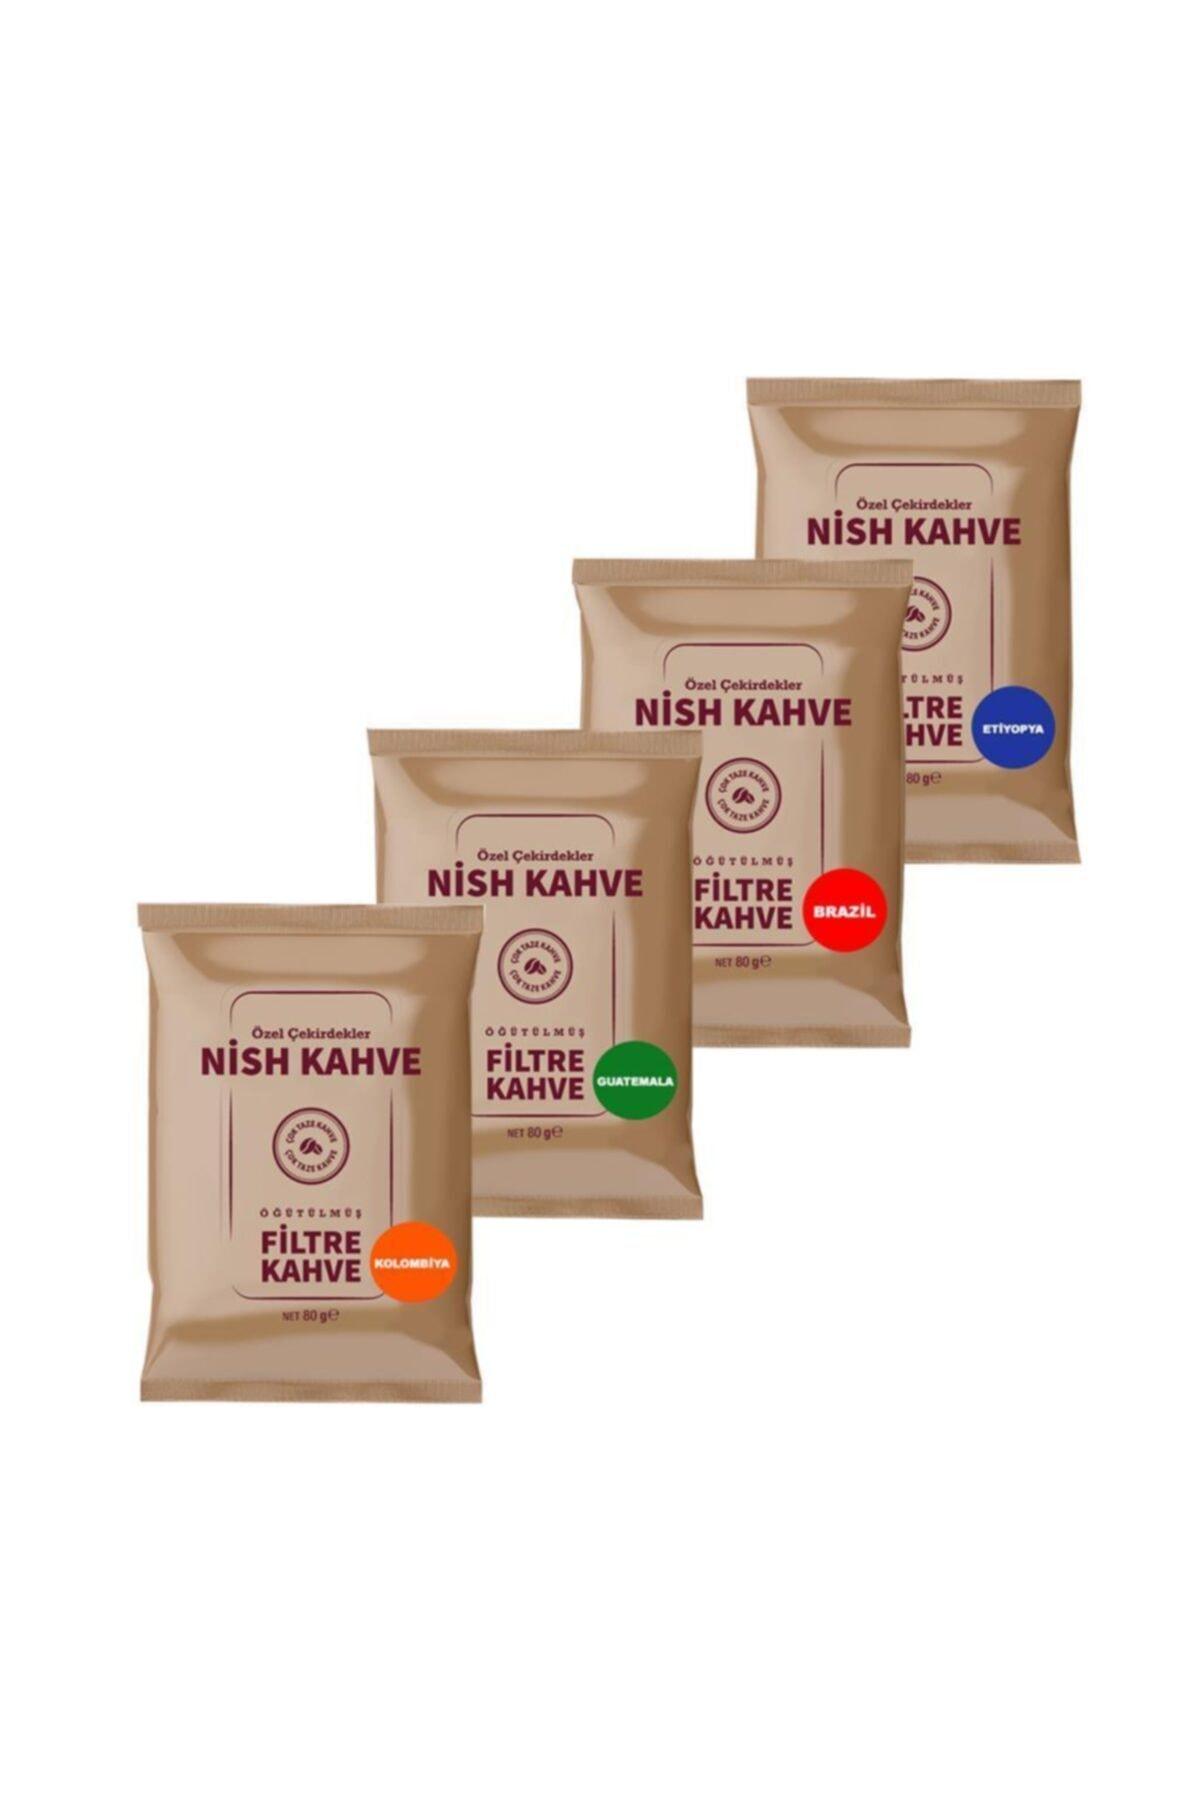 Nish Kahve Filtre Kahve Nish Brazil Colombia Guatemala Etiyopya 80 Gr 4'lü Paket 1